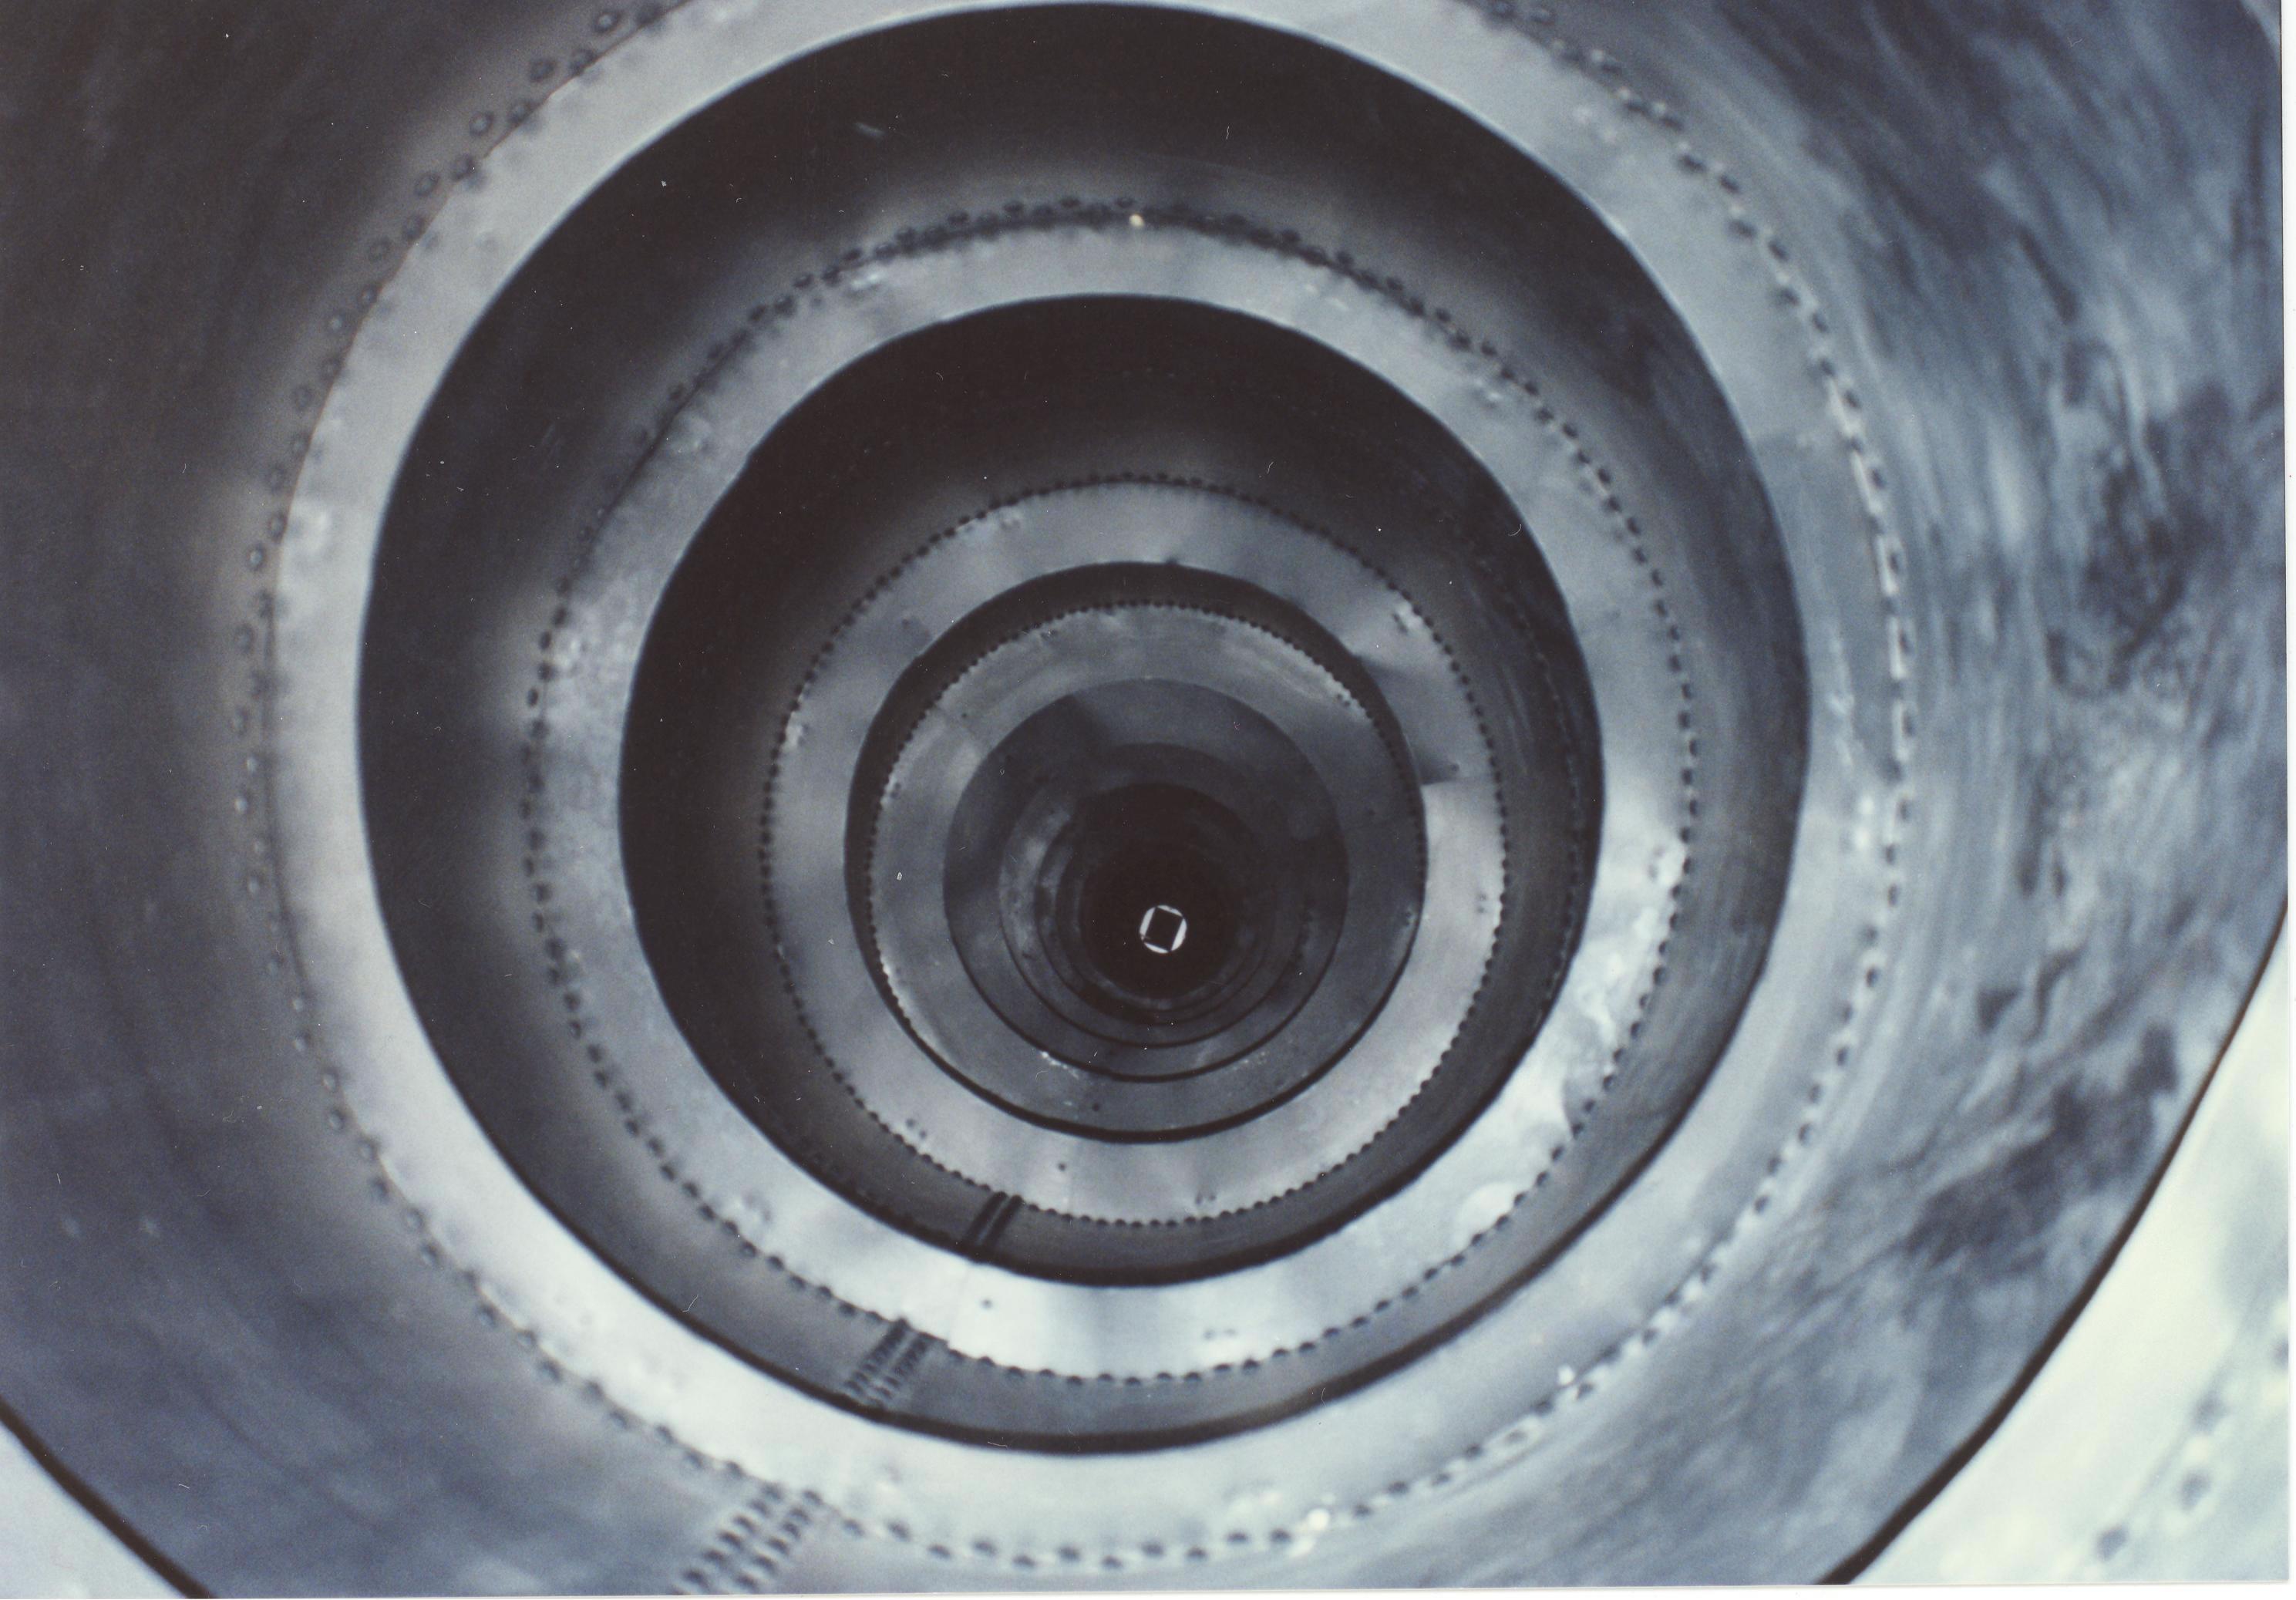 Inch telescope lens removal inch telescope lens